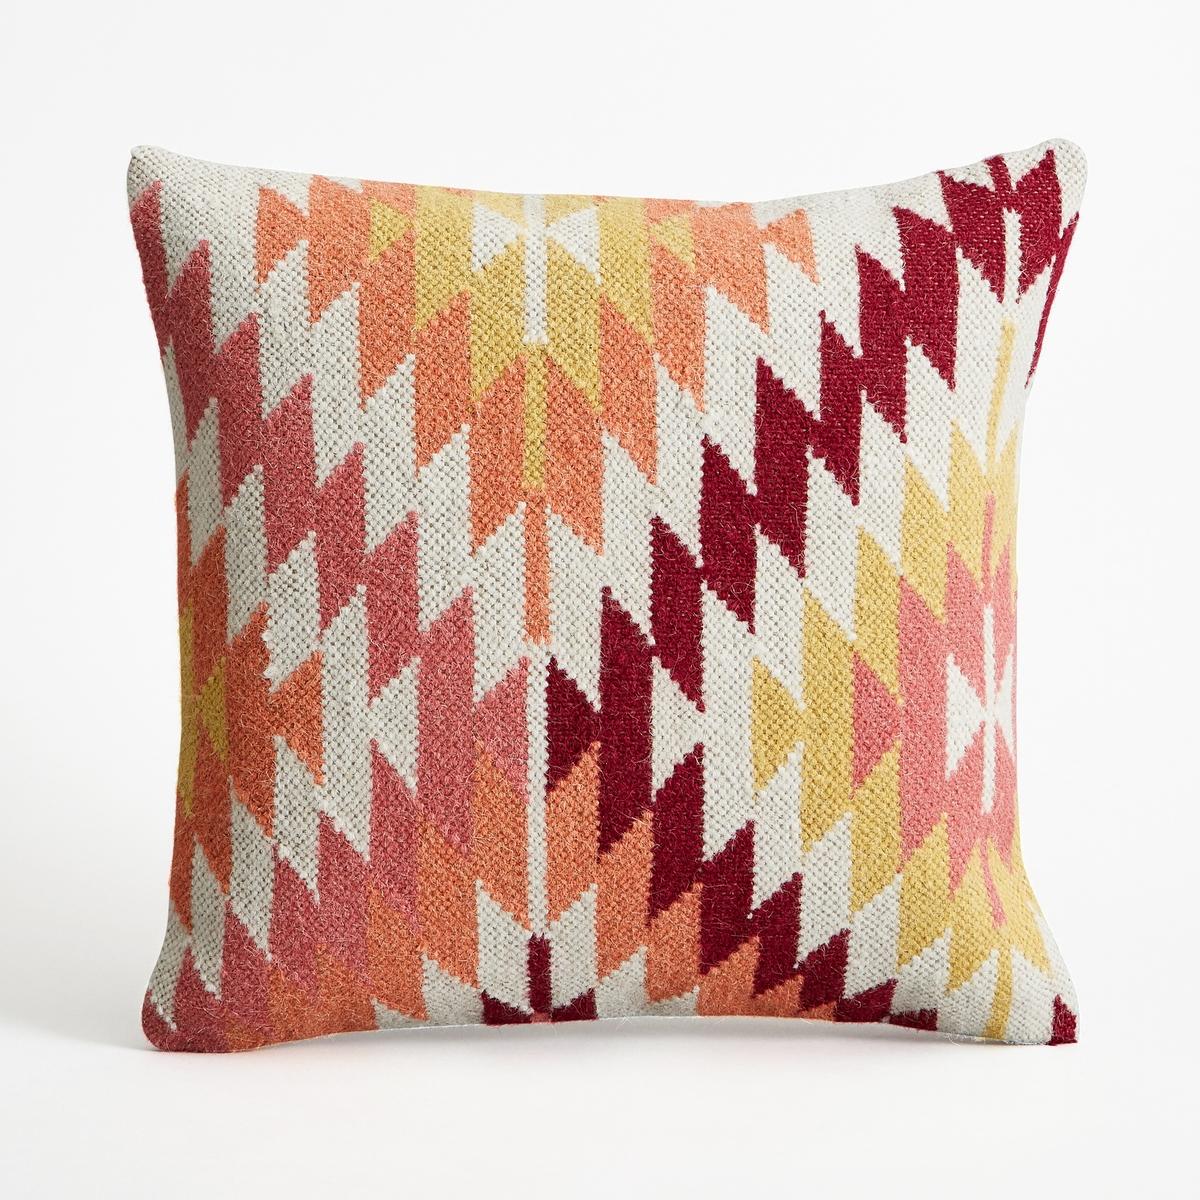 Наволочка на подушку-валик Pukeiti<br><br>Цвет: разноцветный<br>Размер: 45 x 45  см